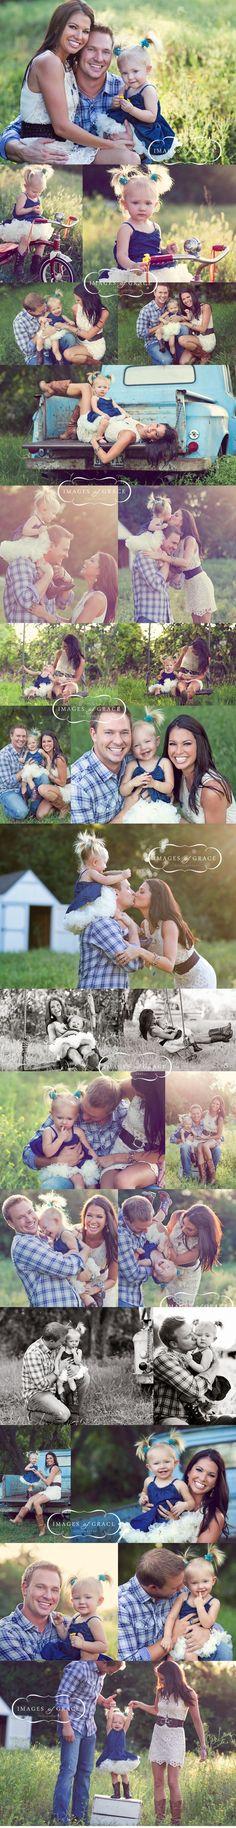 Adorable family photos love melissa rycroft! - Wink Chic